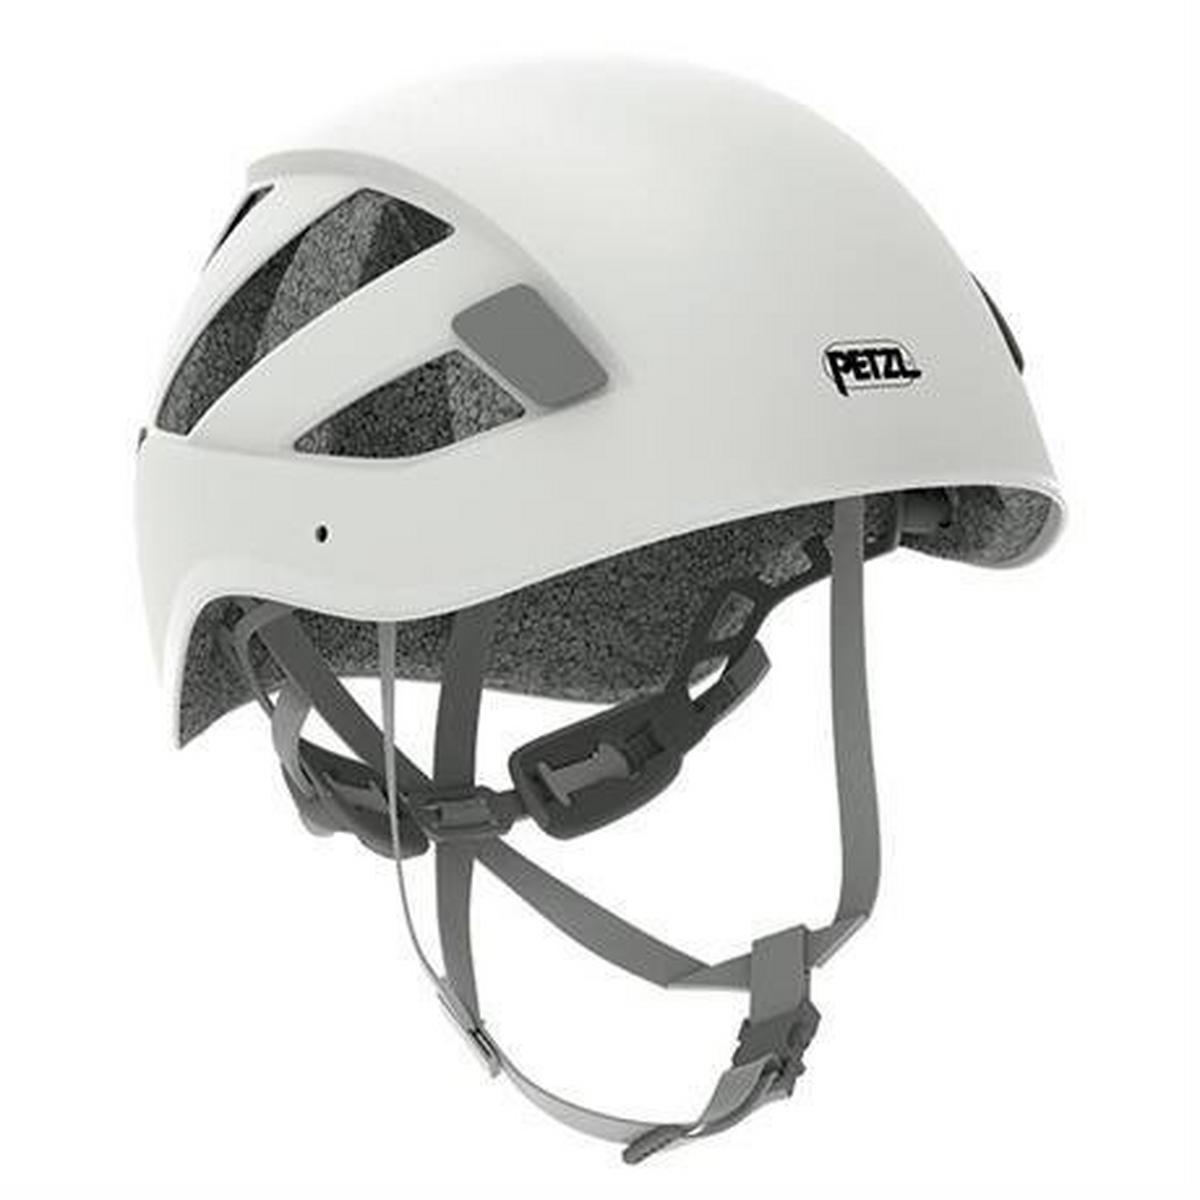 Petzl Charlet Petzl Climbing Helmet Boreo White